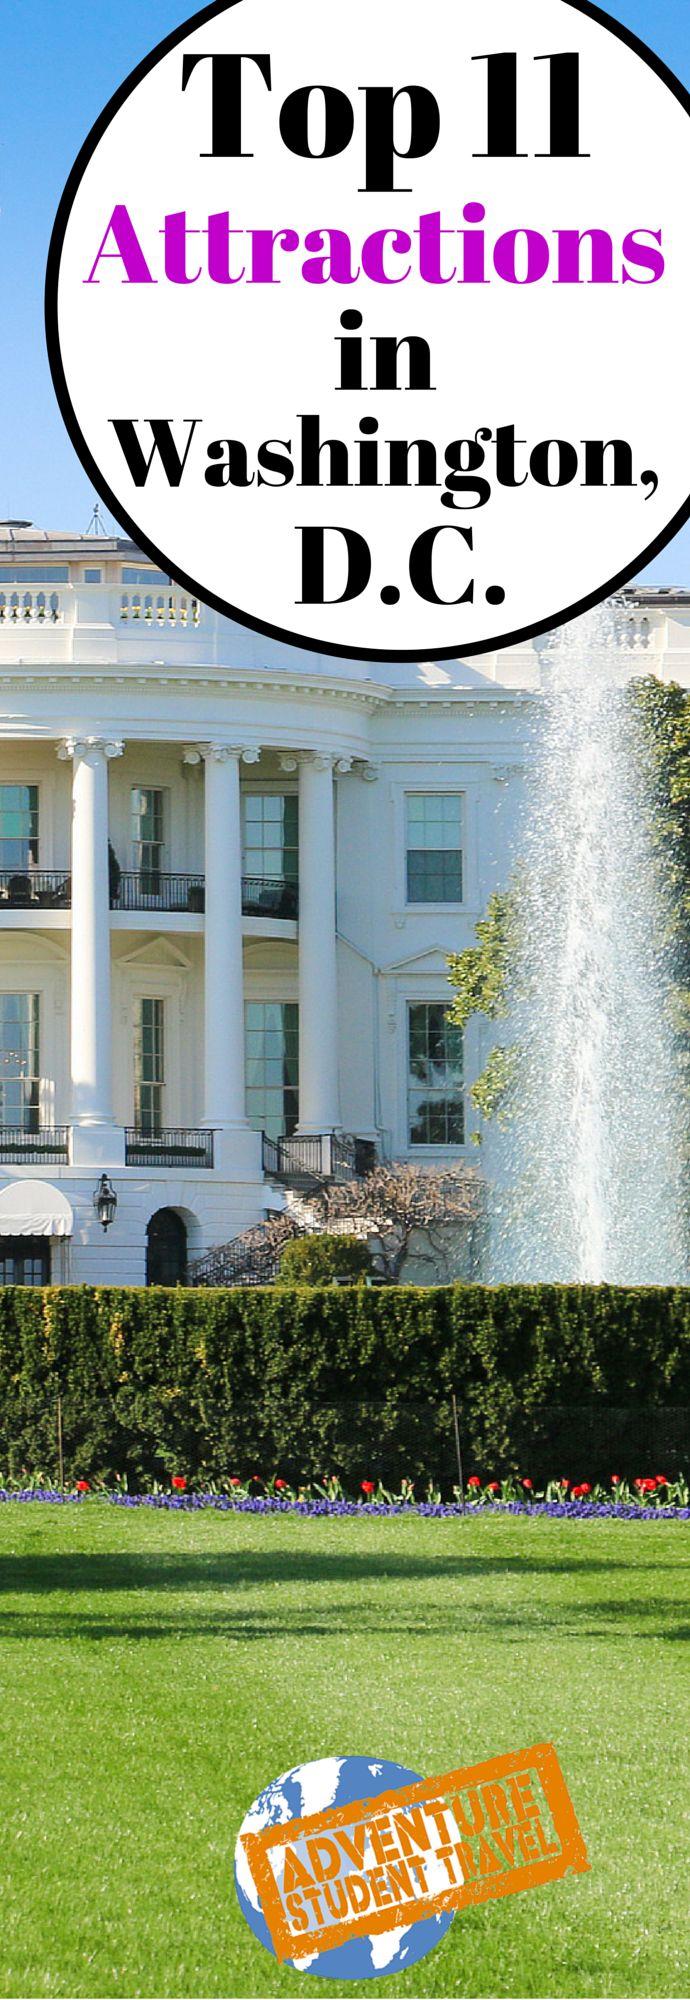 Top 11 Attractions in Washington, D.C.  http://www.adventurestudenttravel.com/top-11-attractions-in-washington-d-c/